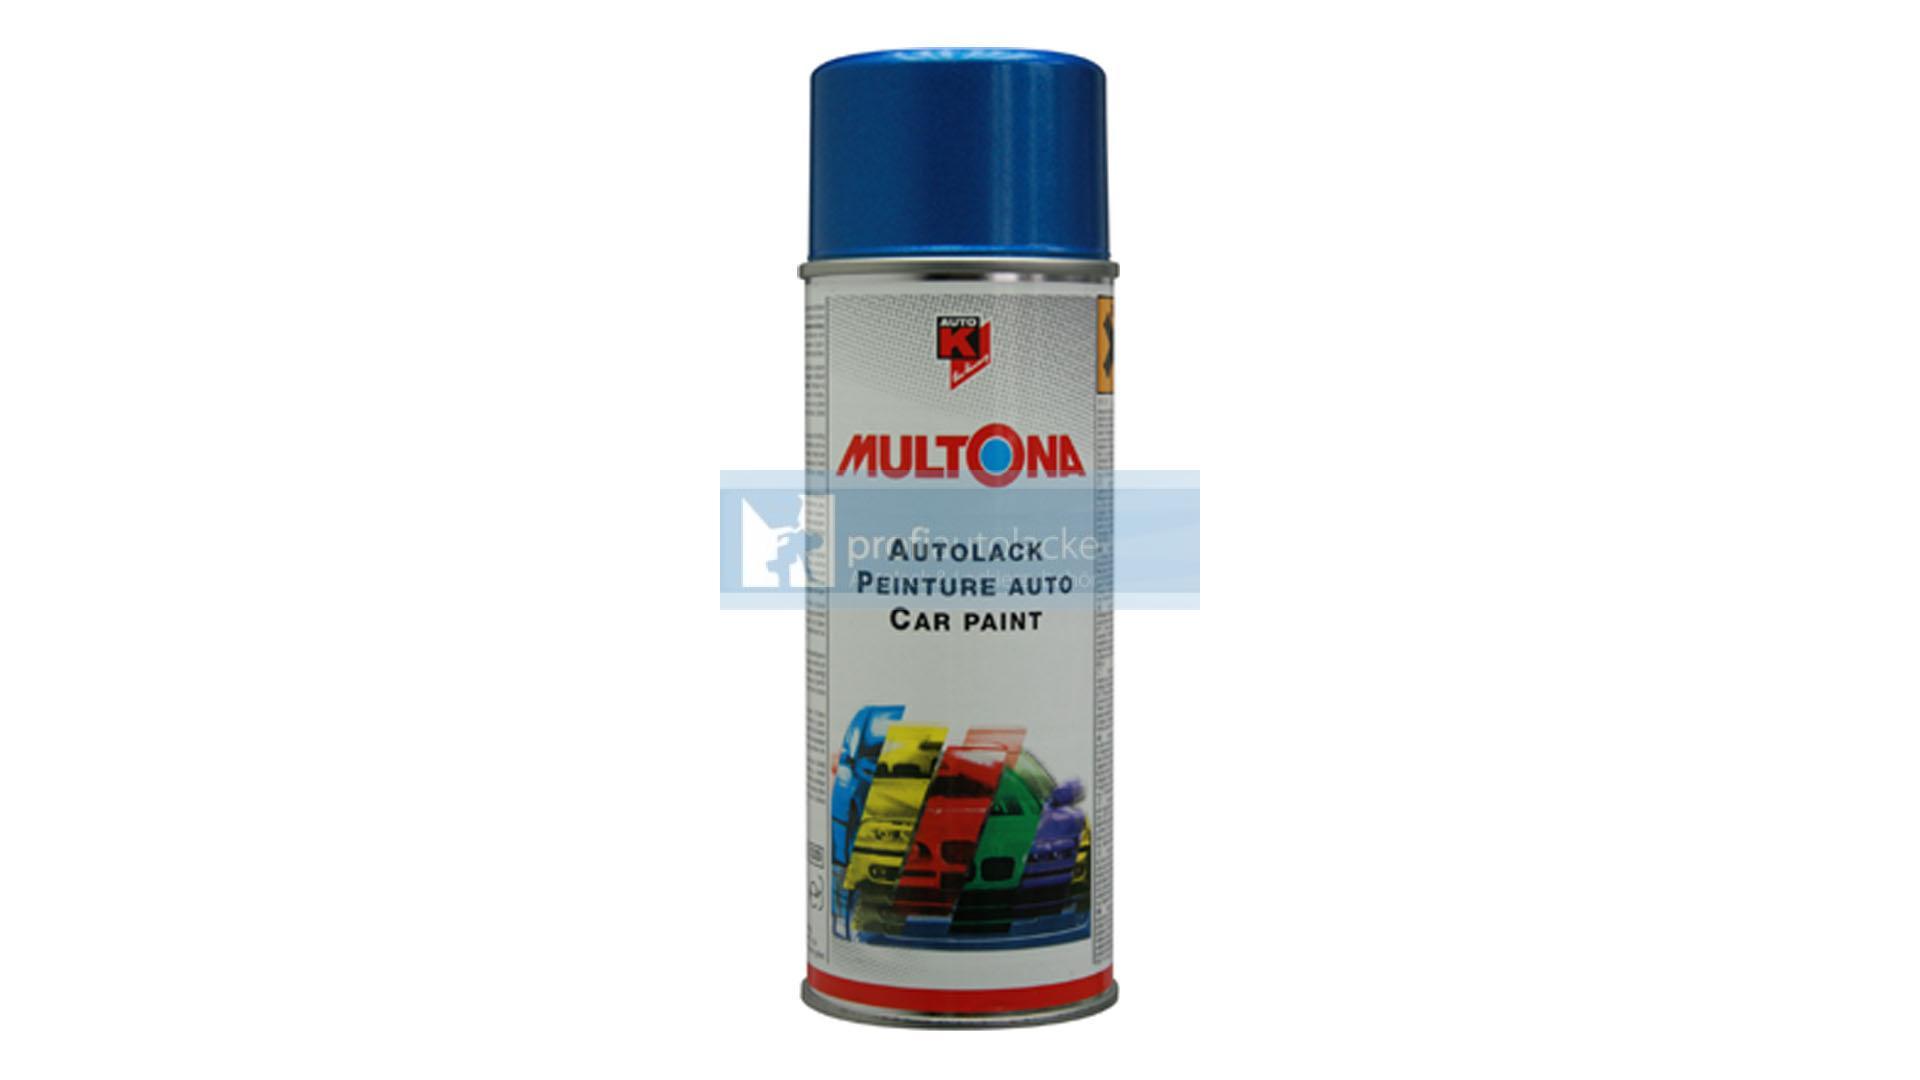 multona autolack spray 2 schicht klarlack 600999 400ml ebay. Black Bedroom Furniture Sets. Home Design Ideas